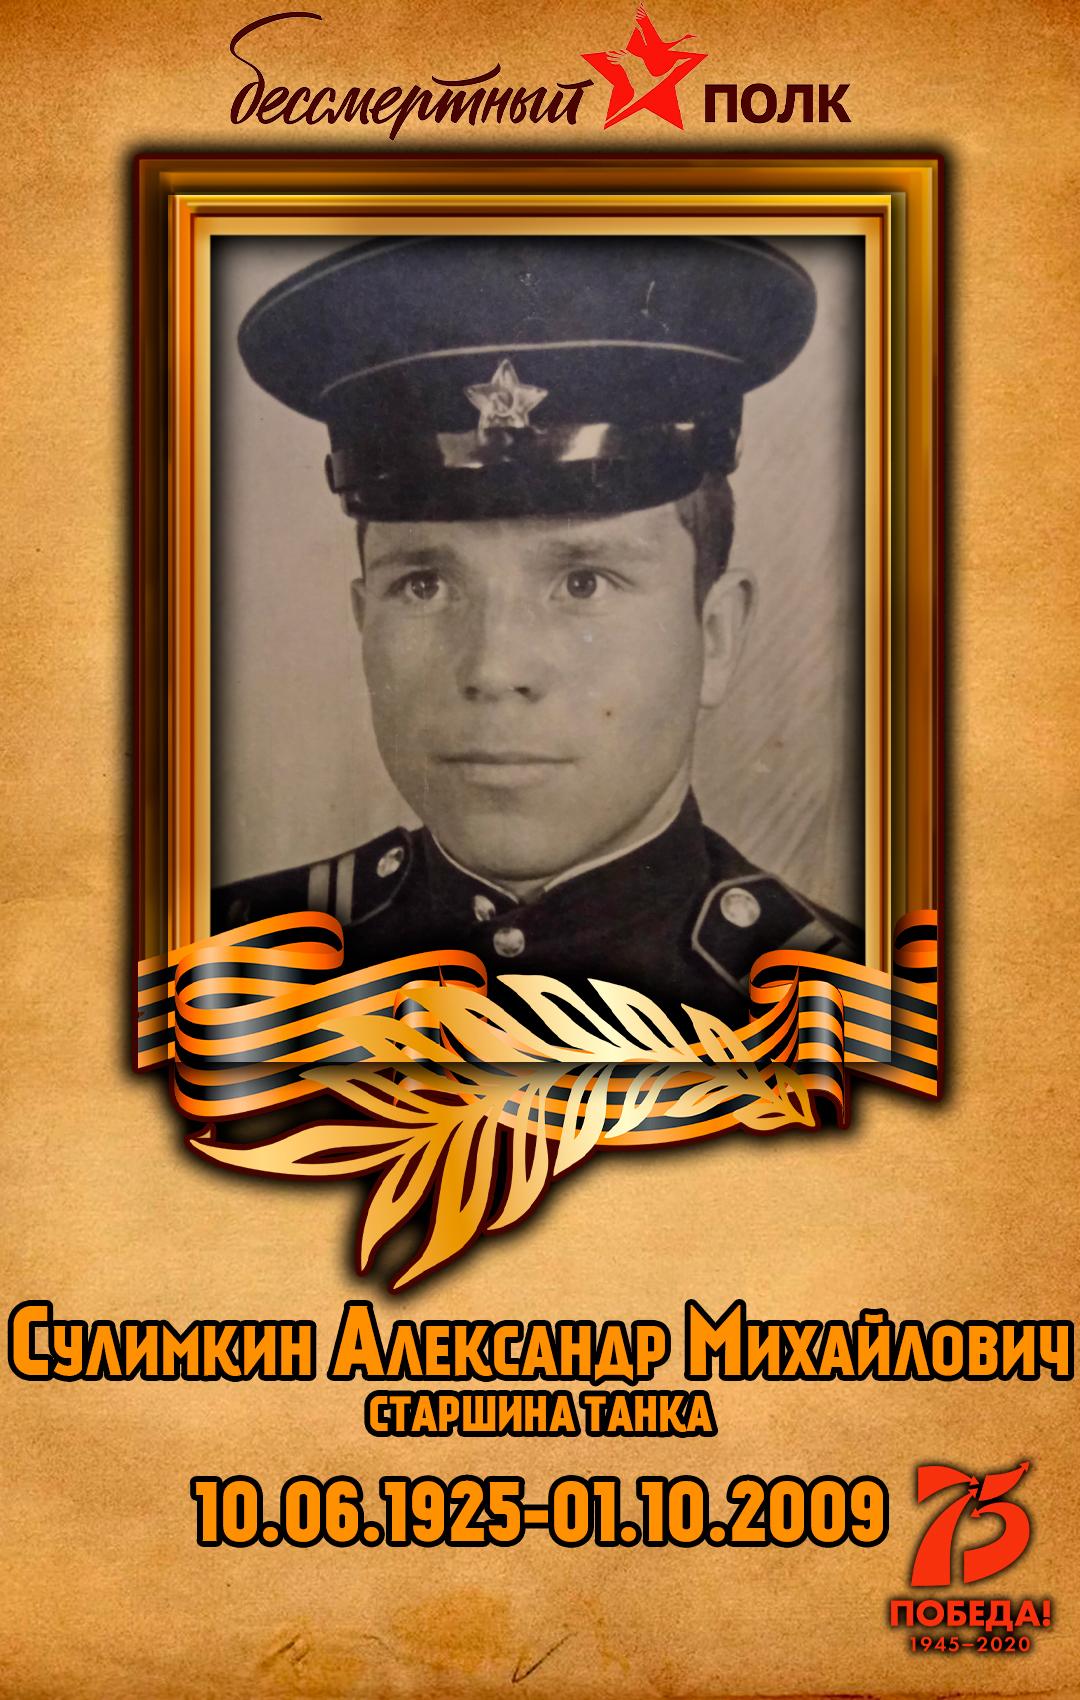 Сулимкин-Александр-Михайлович